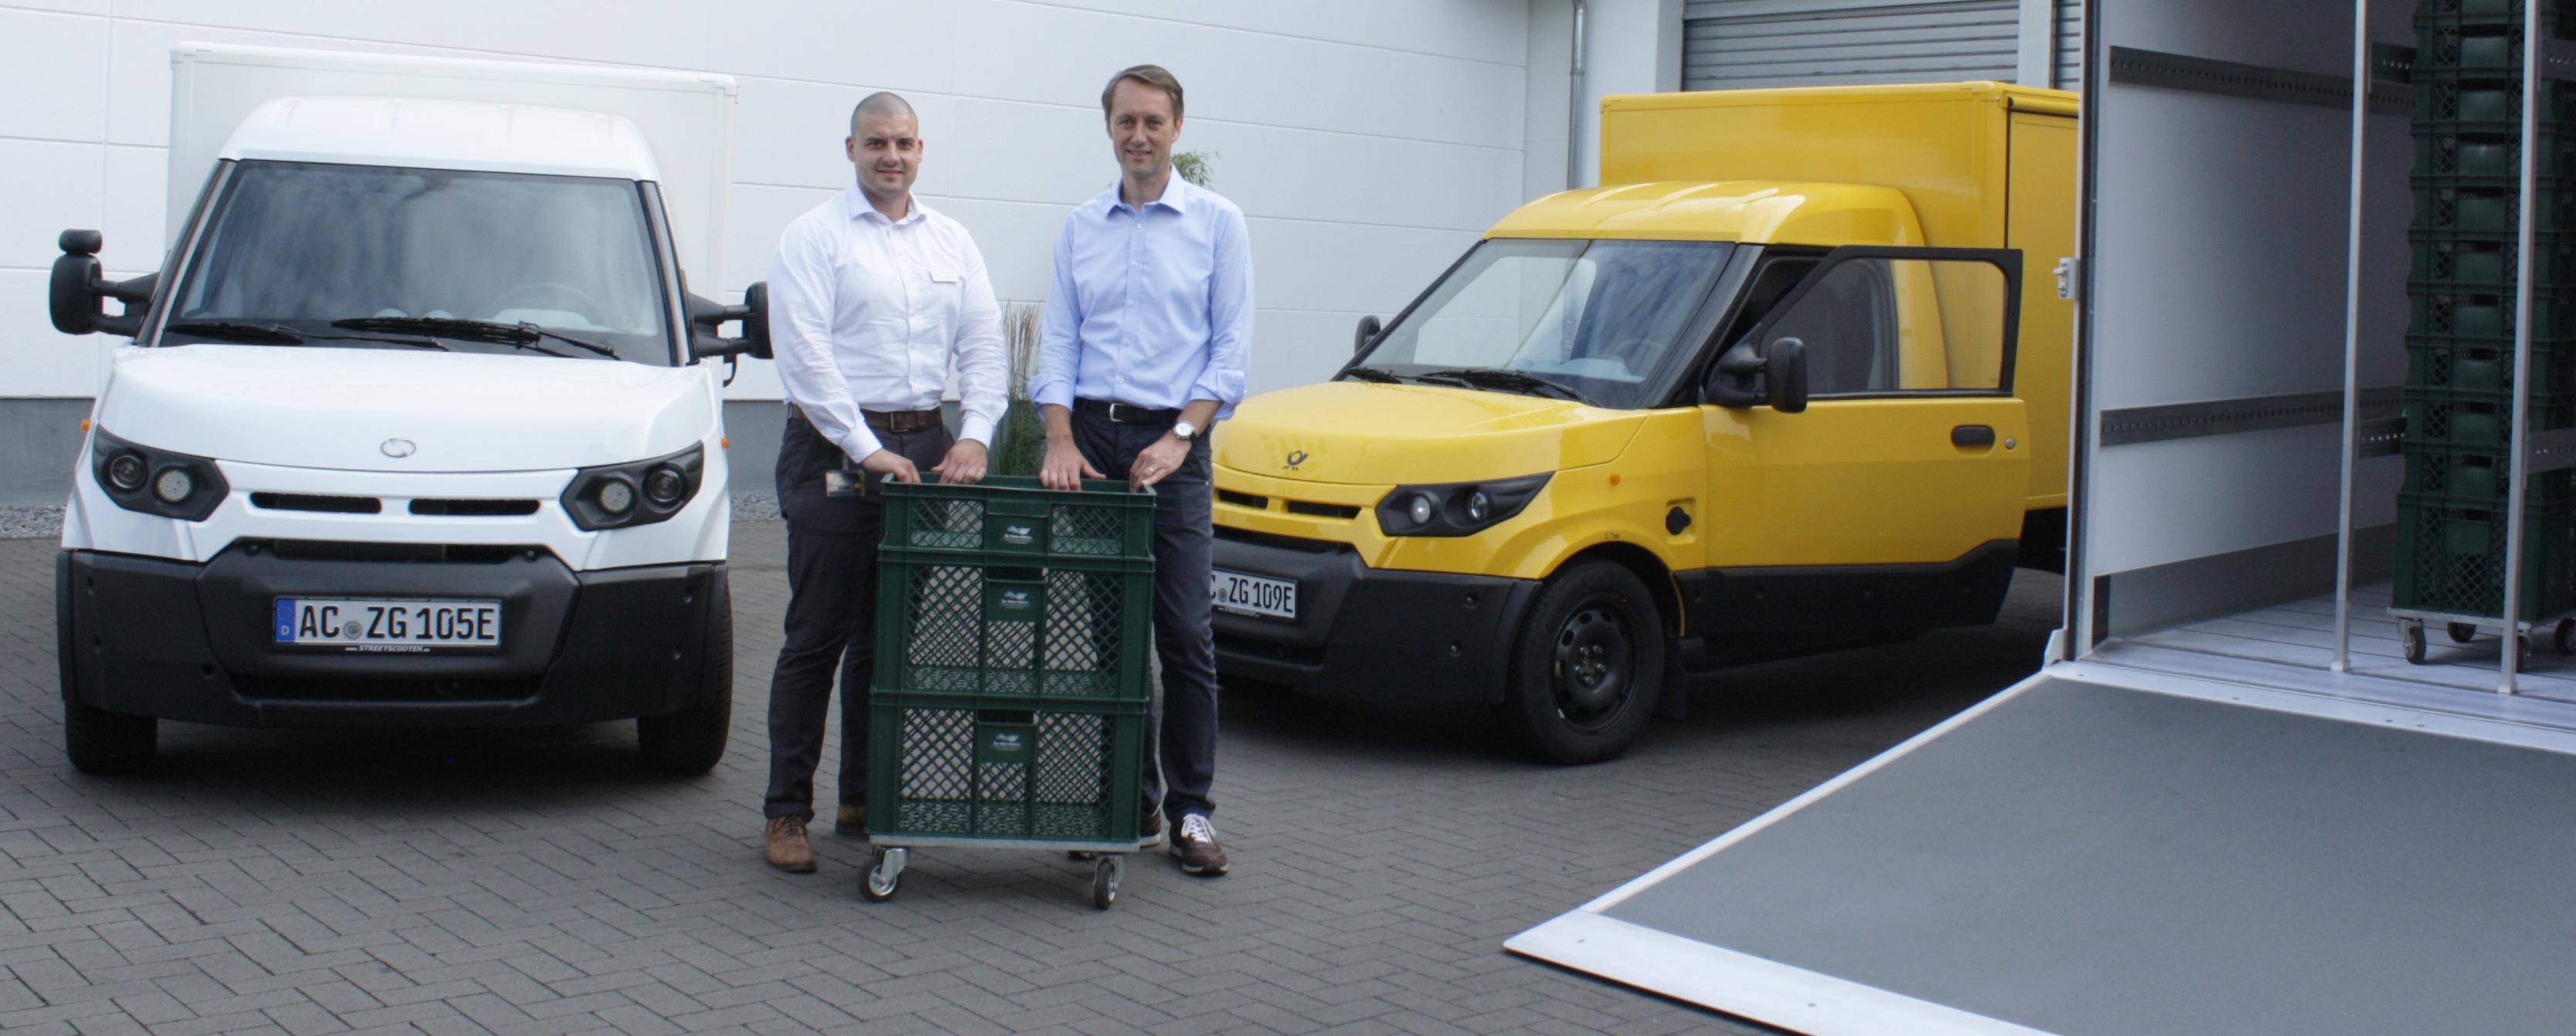 Ihr Bäcker Schüren Hilden lässt E-Fahrzeuge als Lieferwagen bauen